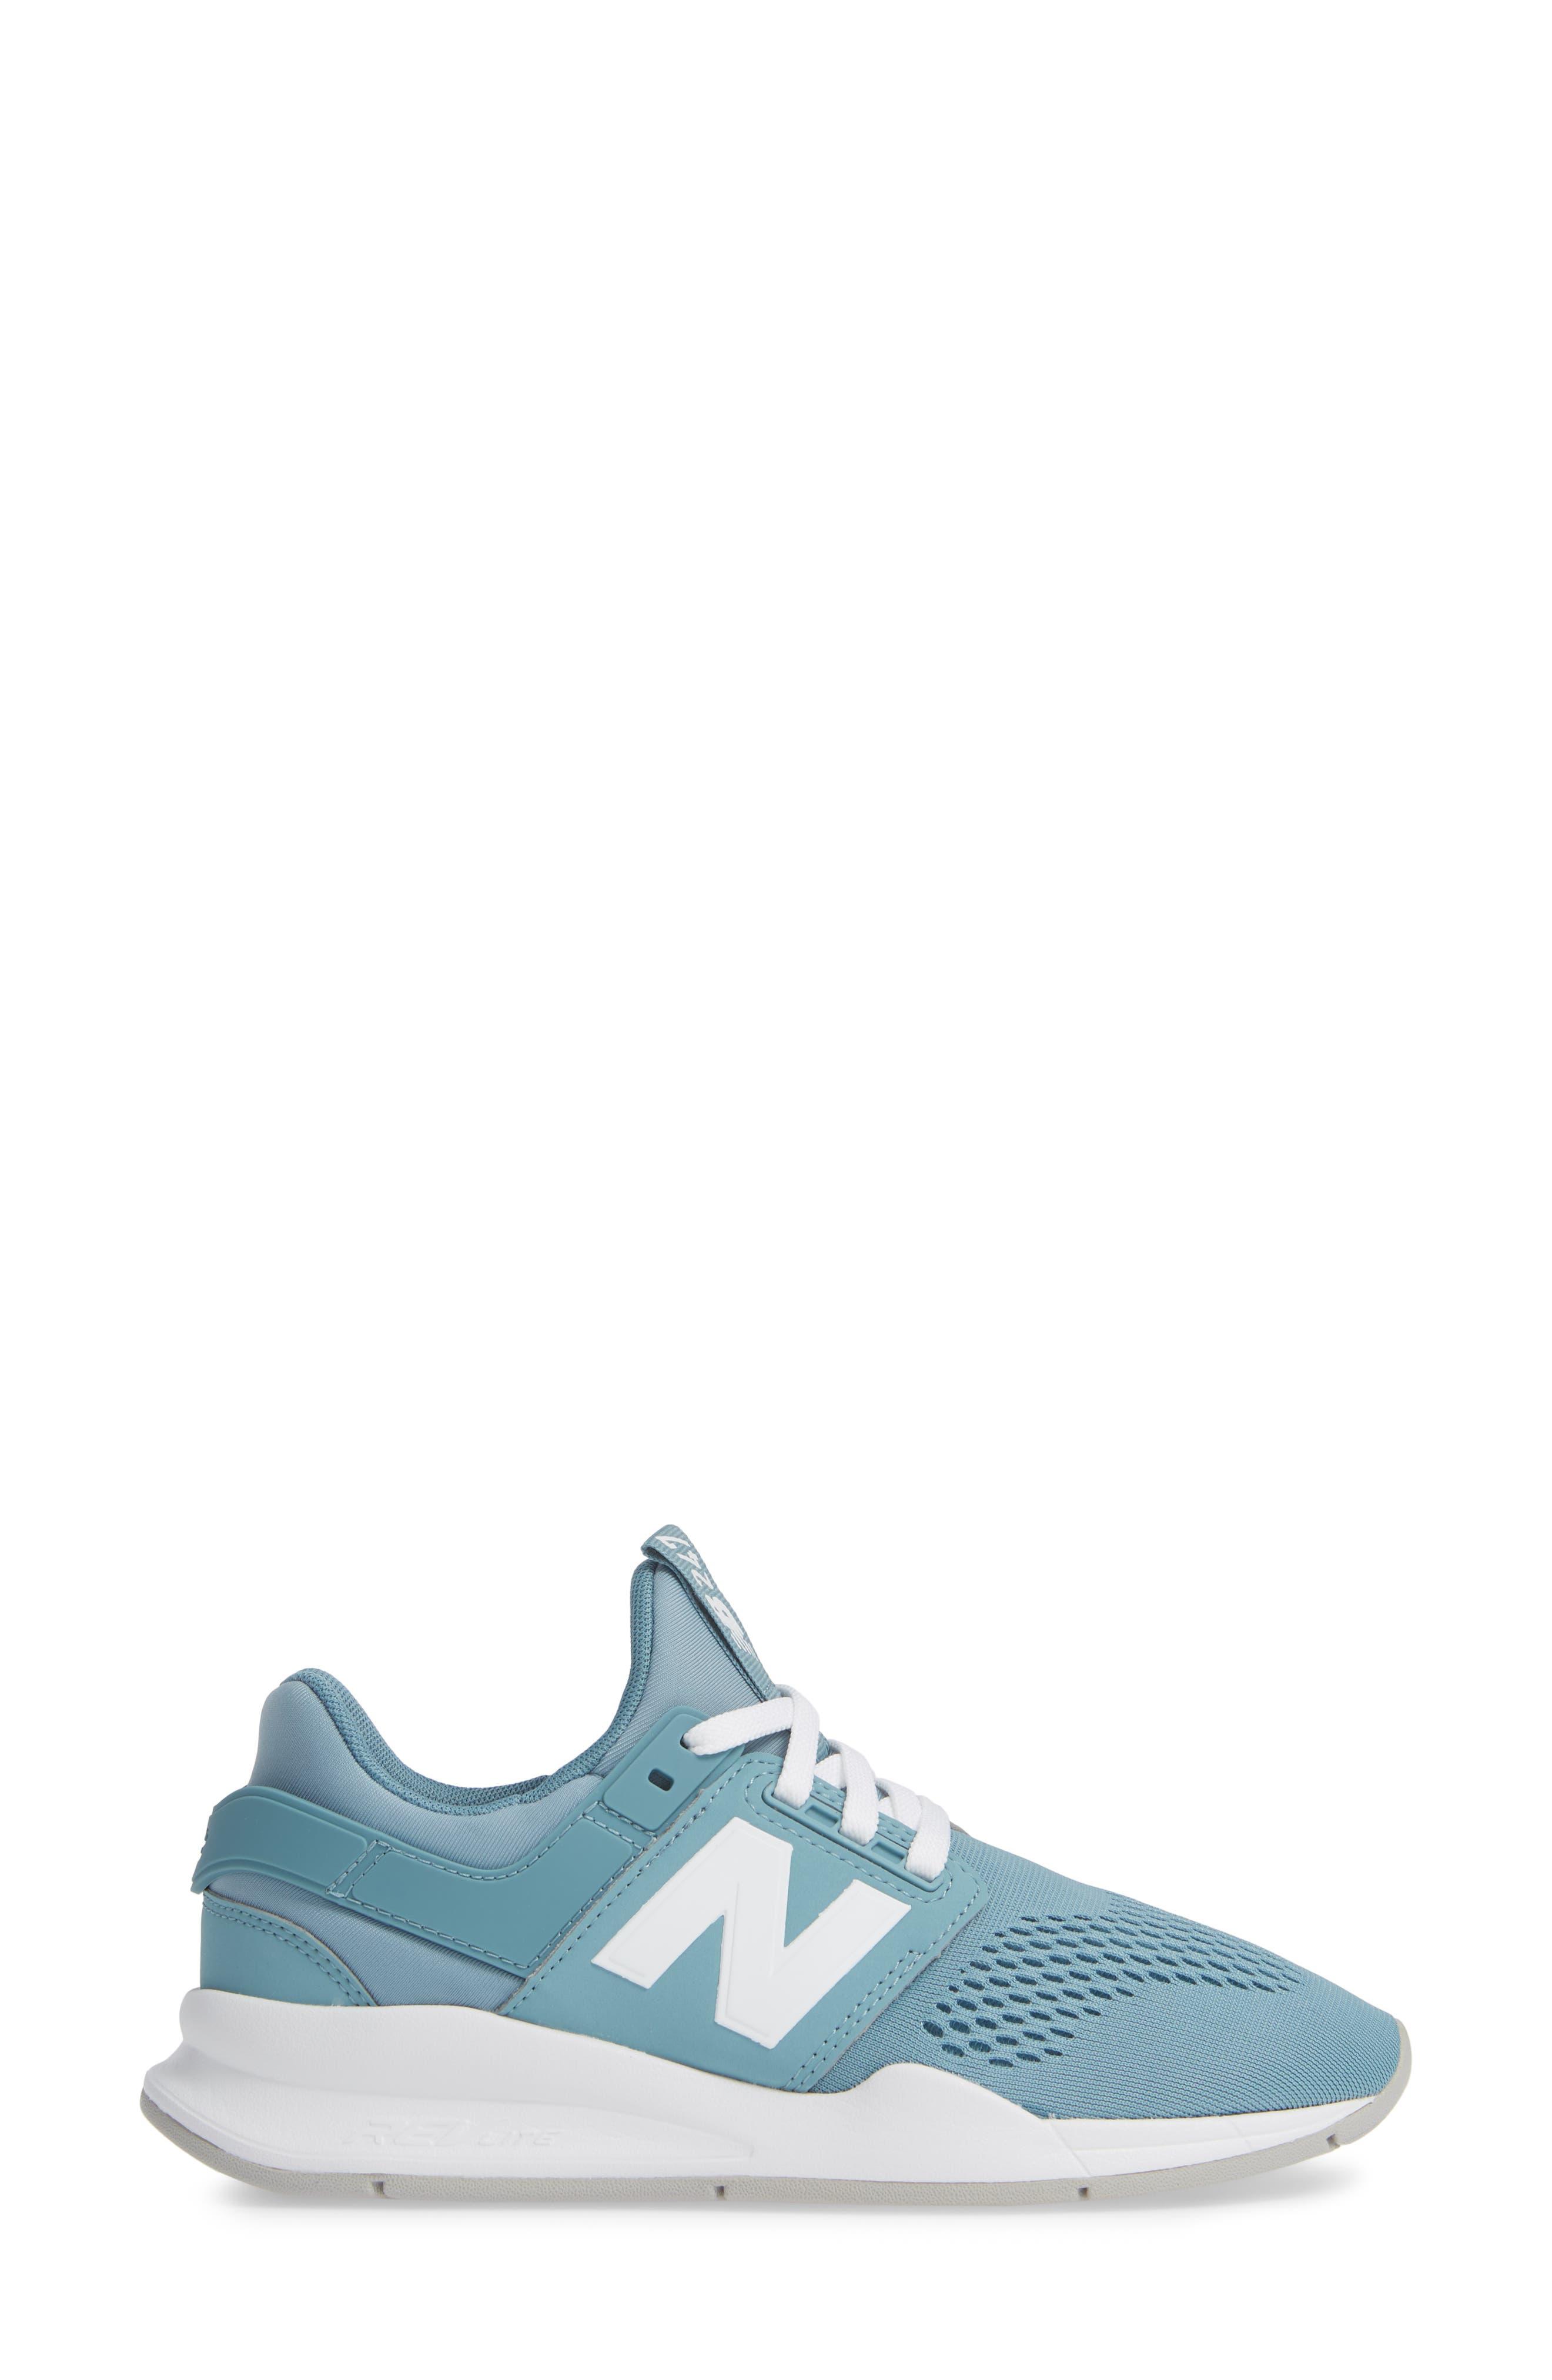 247 Sneaker,                             Alternate thumbnail 3, color,                             SMOKE BLUE